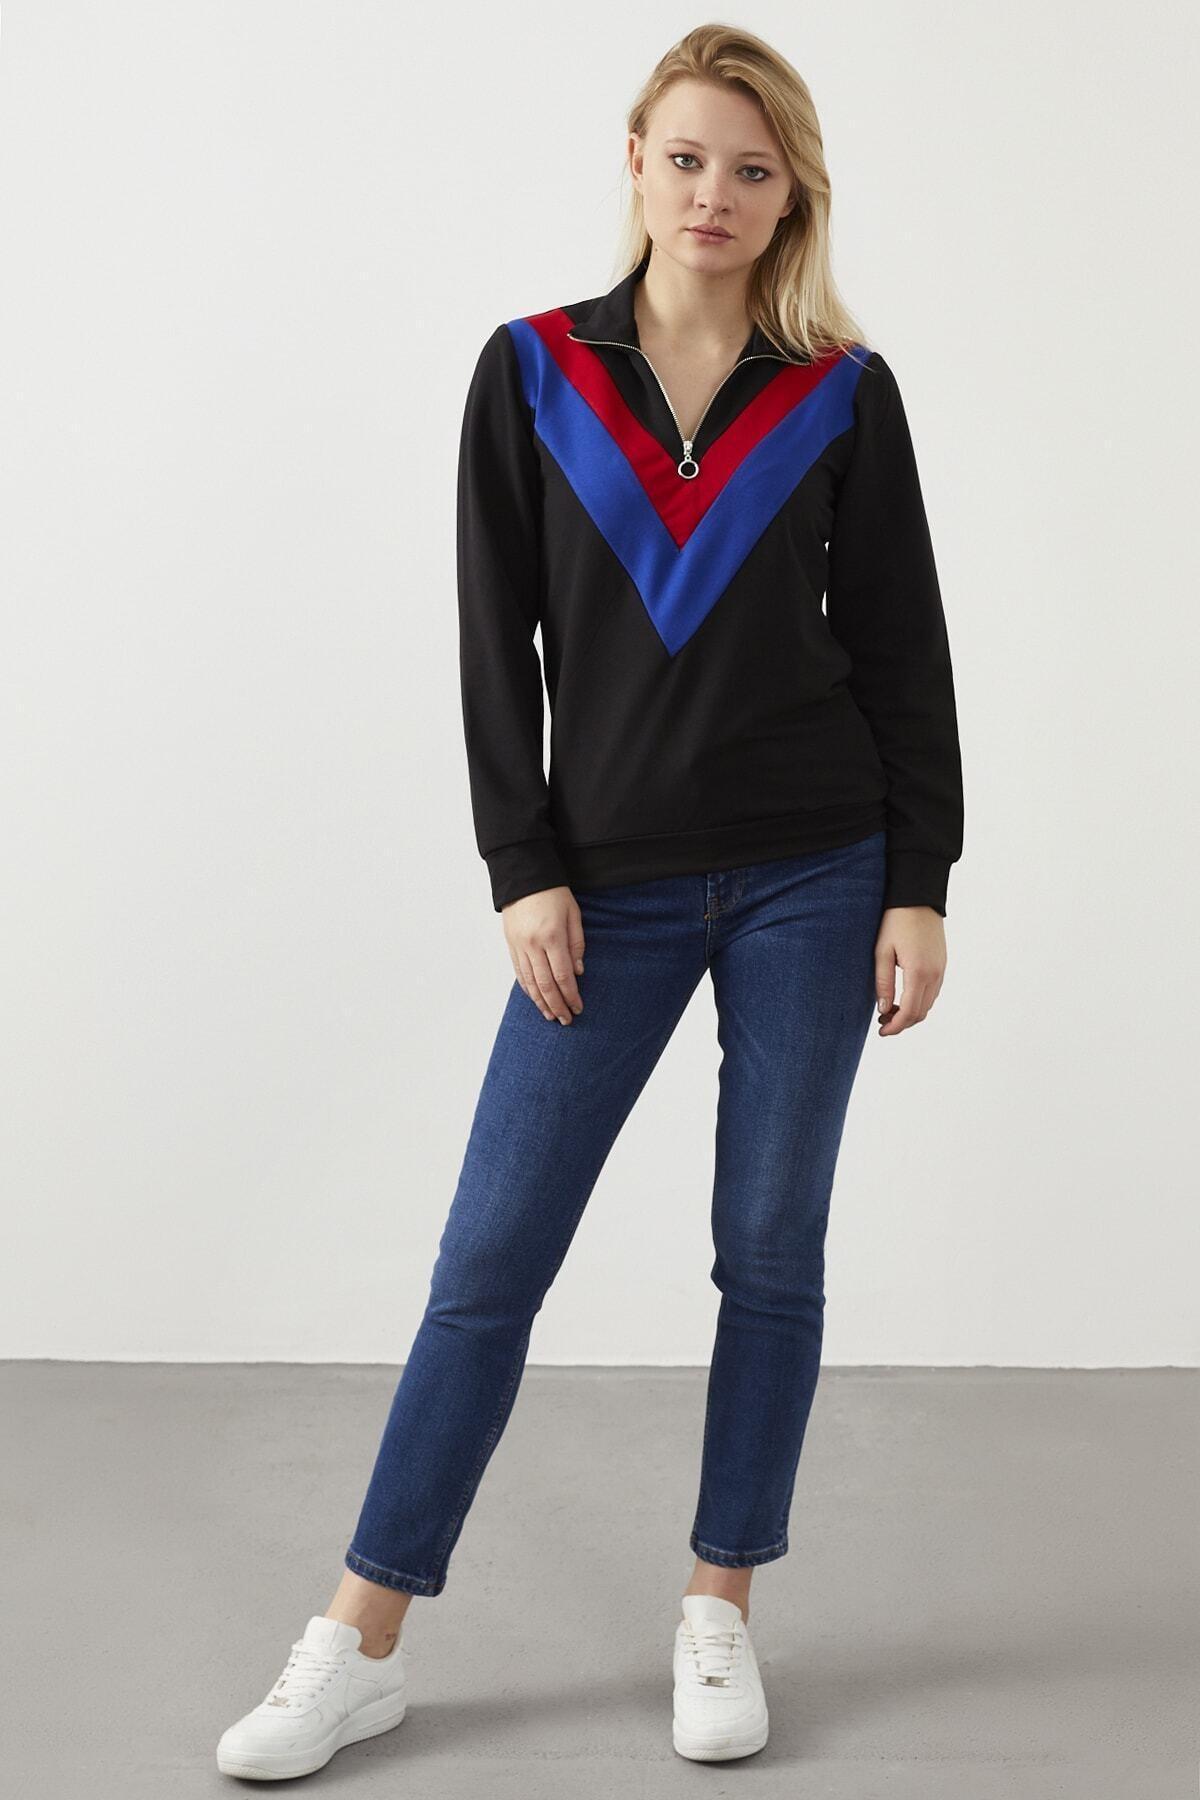 ELBİSENN Kadın Siyah Yaka Fermuar Detay Sweatshirt 2